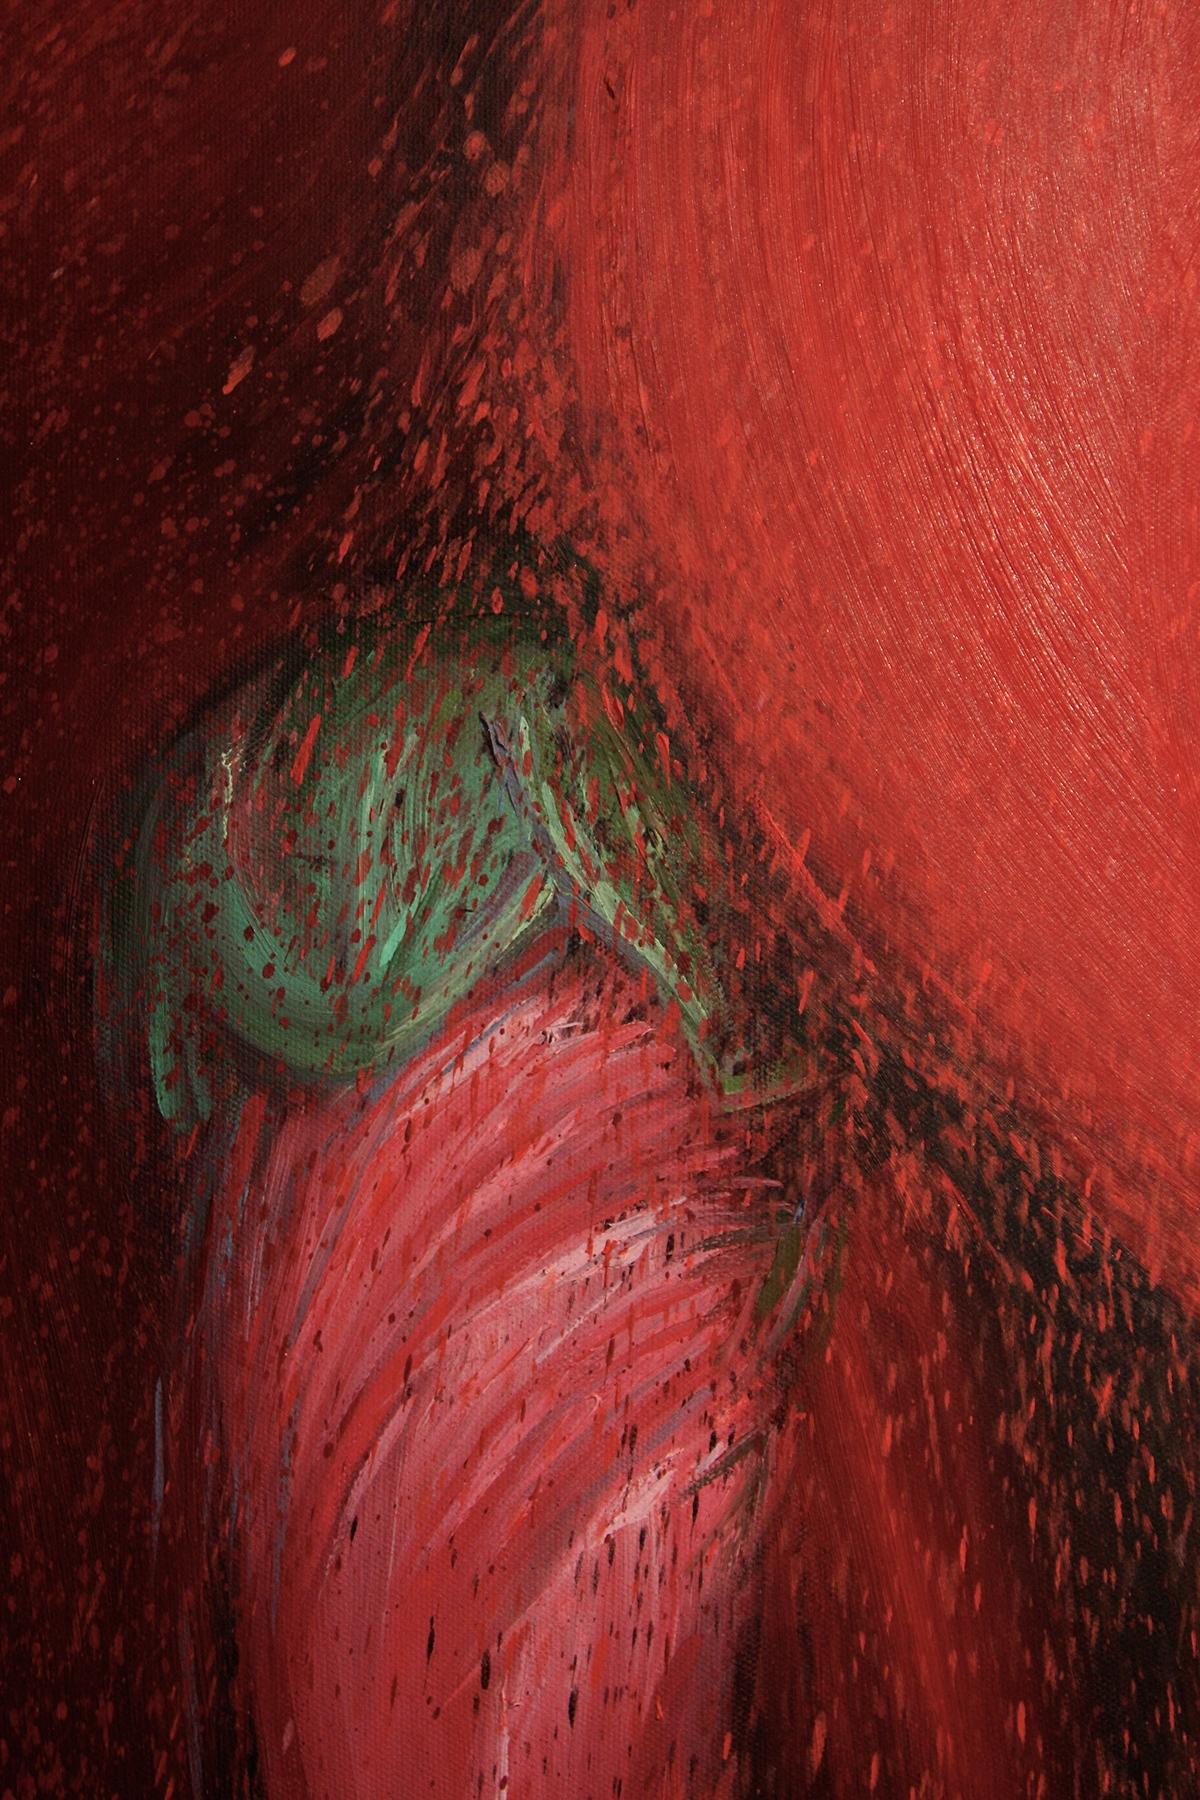 Adobe Portfolio florals Flowers oil paintings inspiration vibrancy